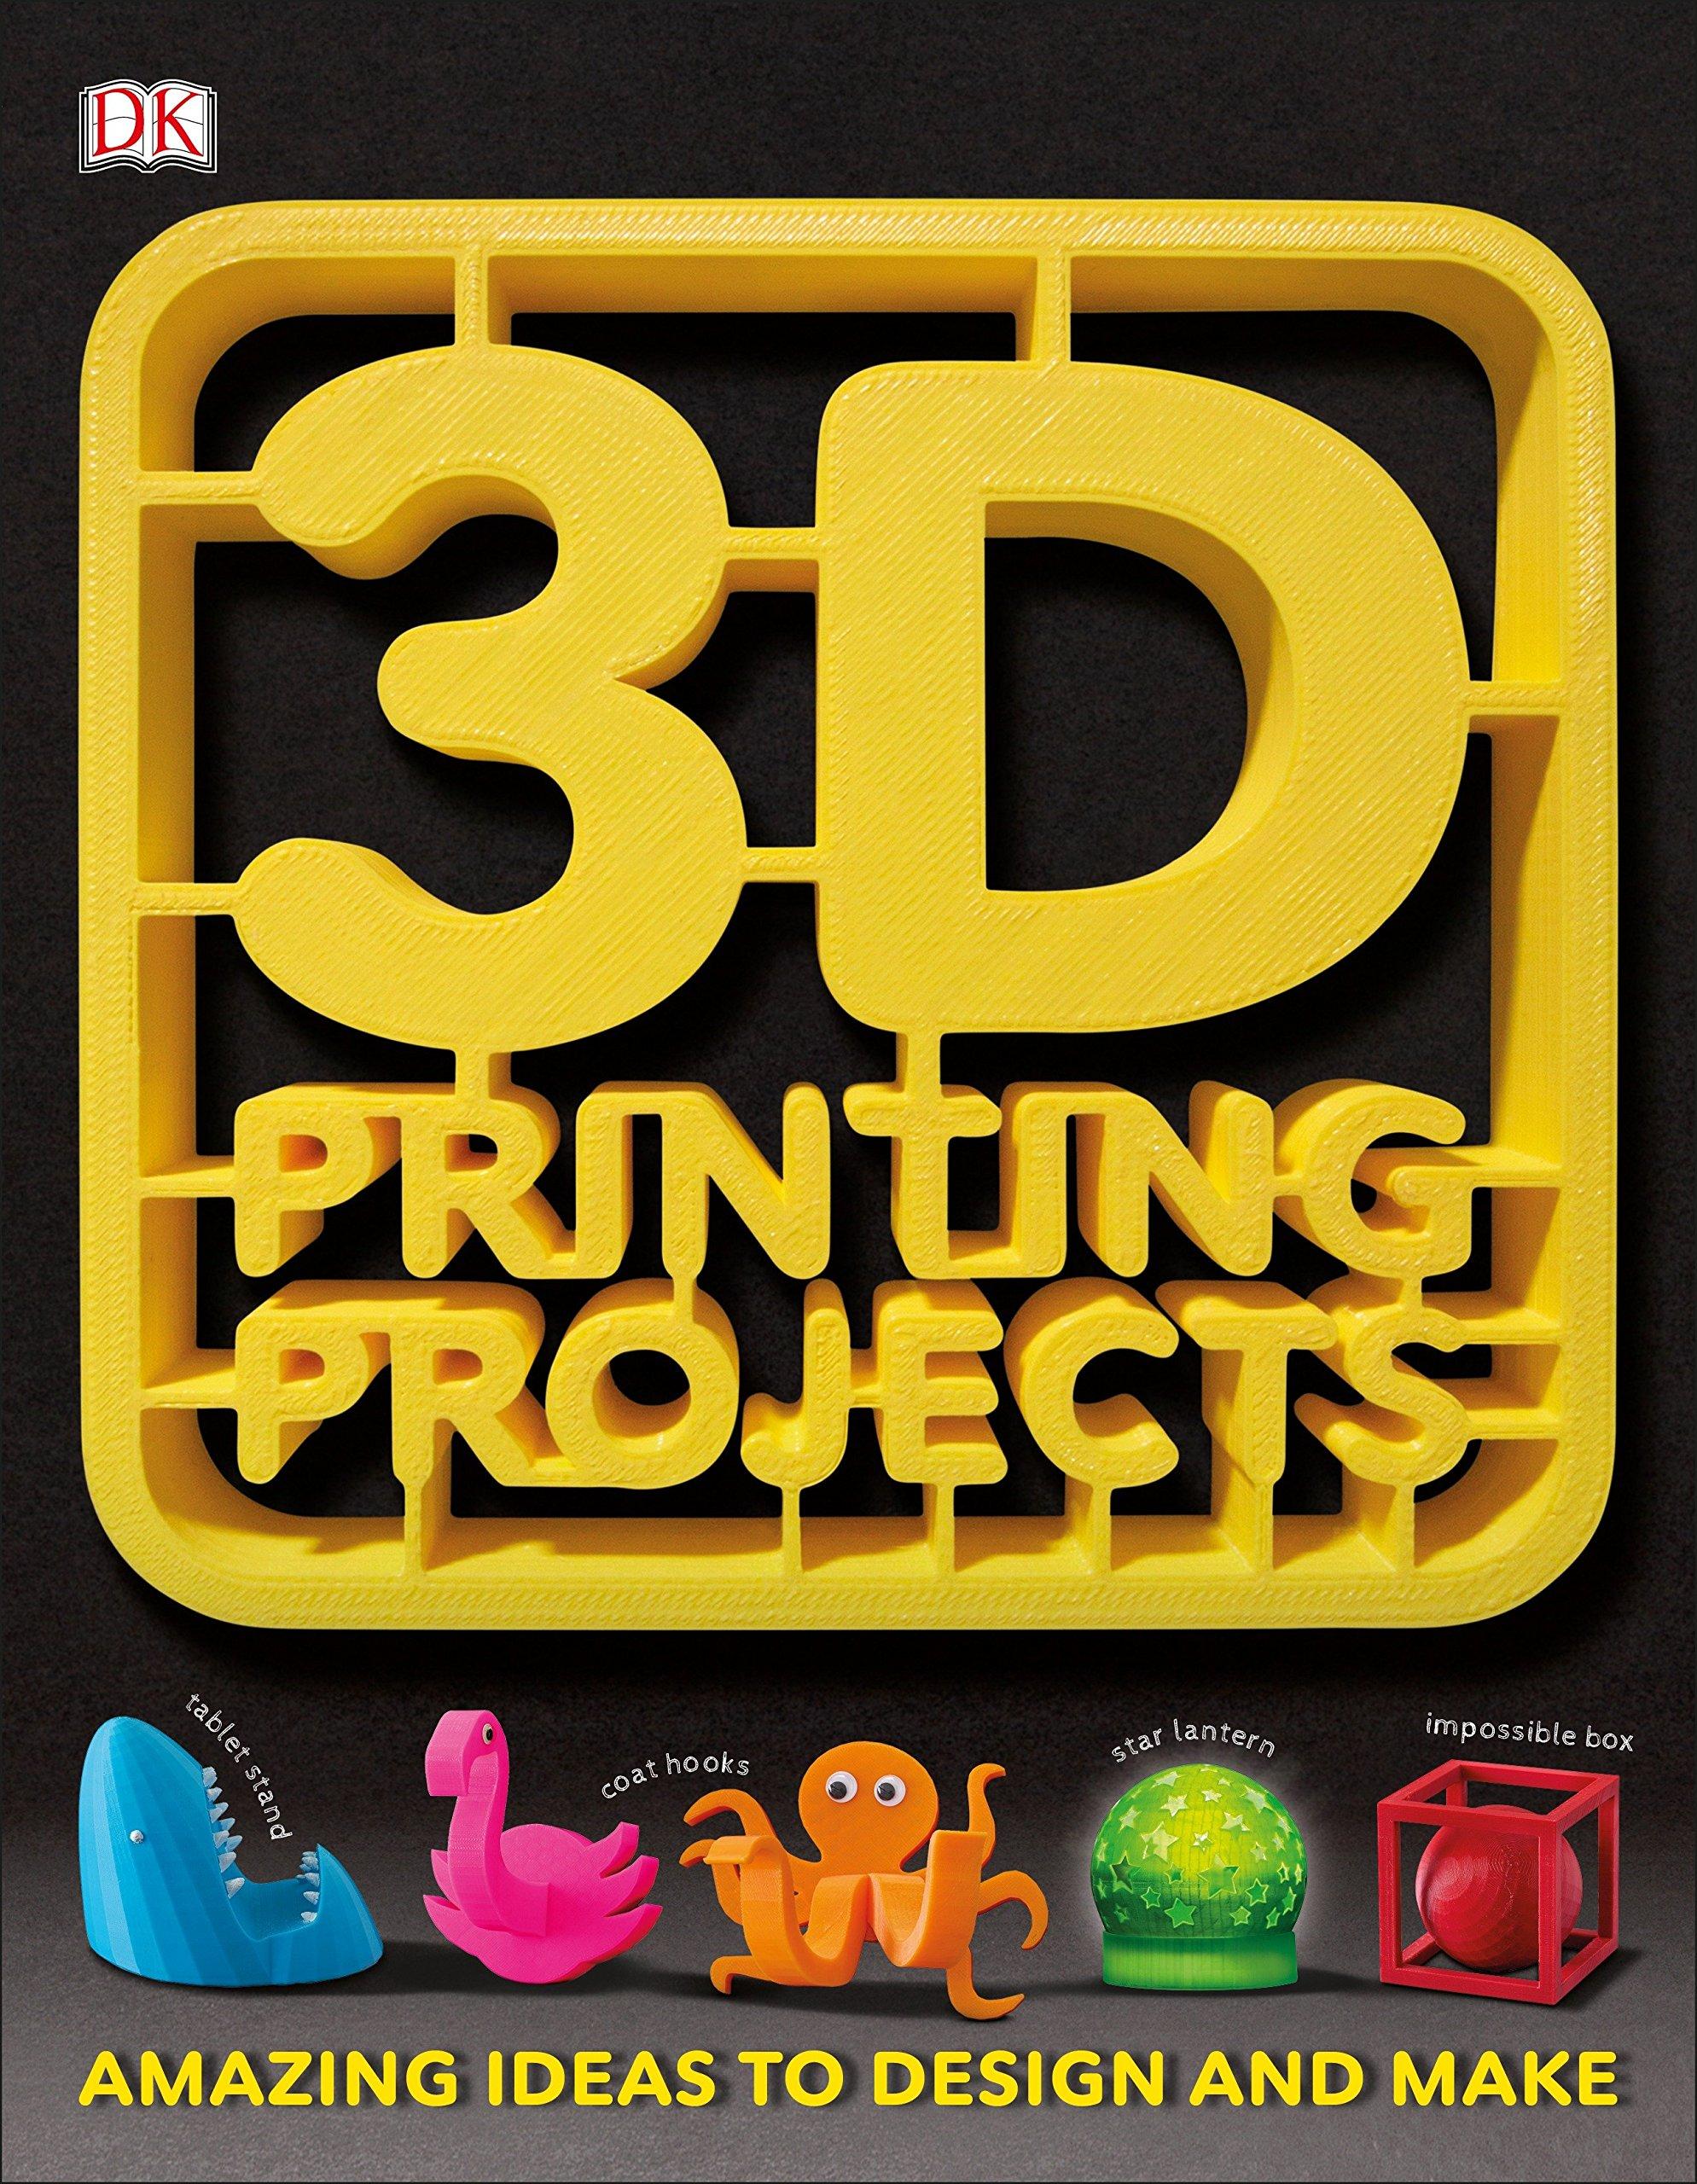 Welp 3D Printing Projects: DK: 9781465464767: Amazon.com: Books GW-54